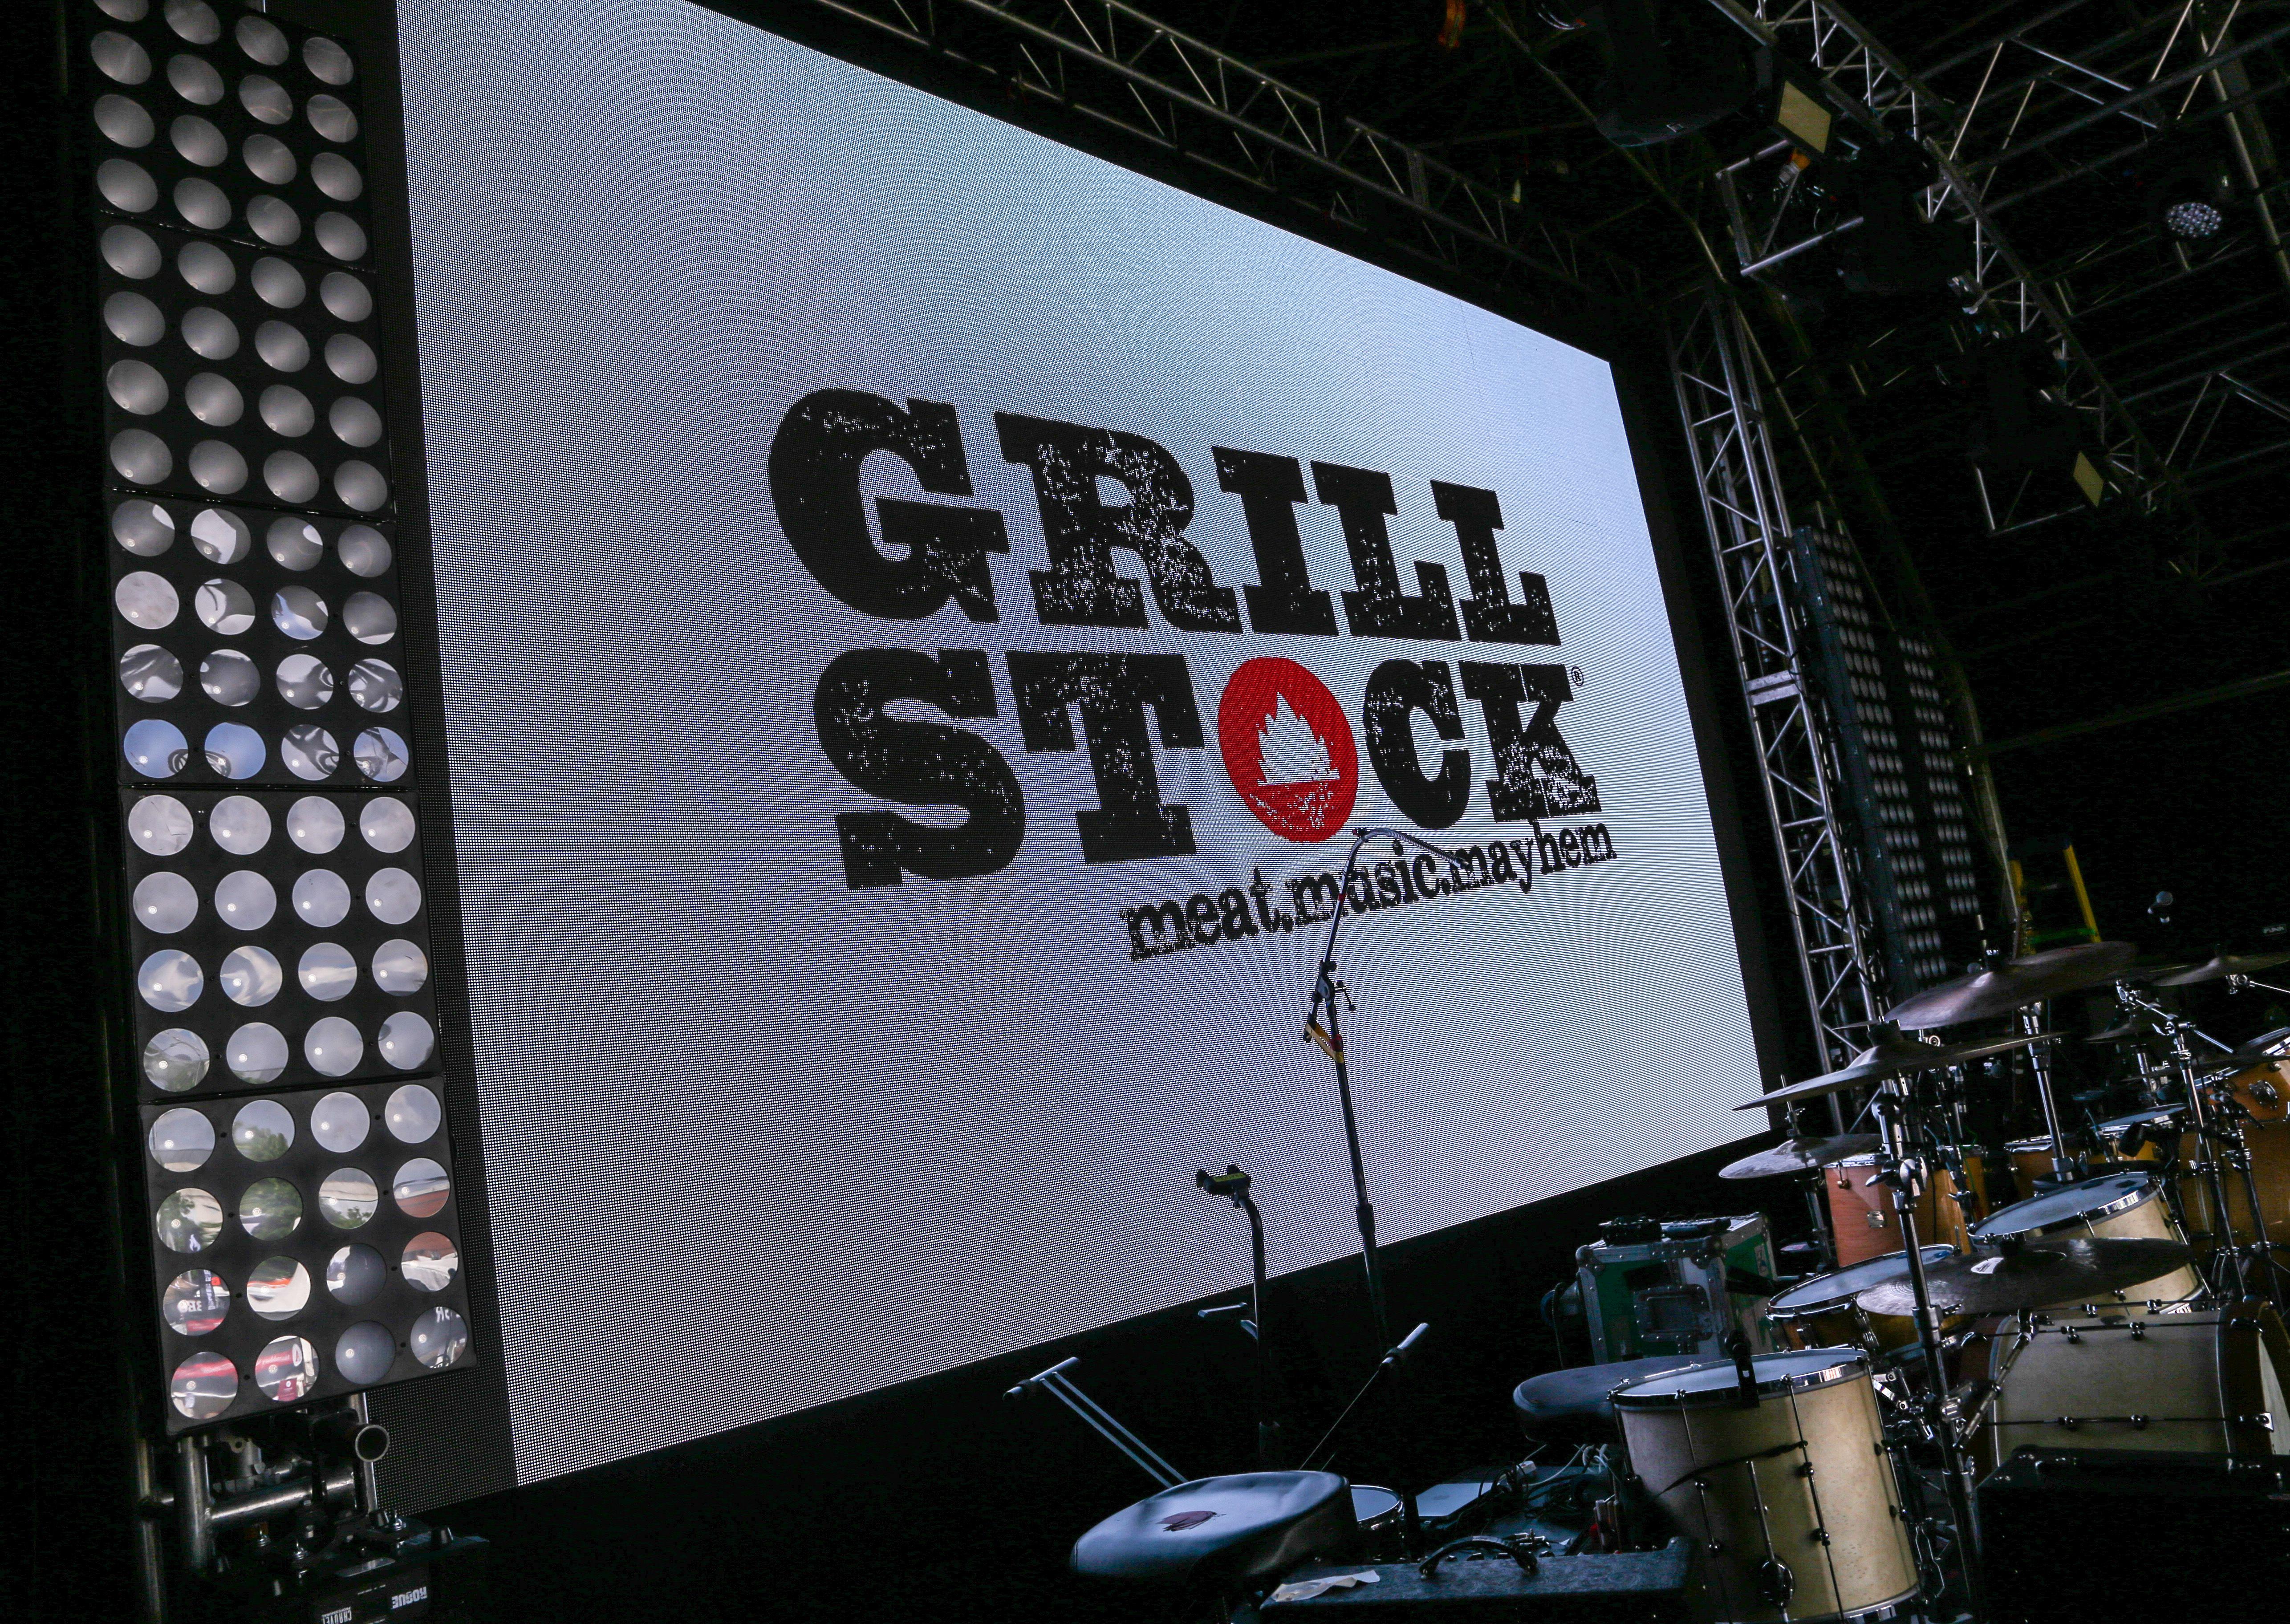 Grillstock